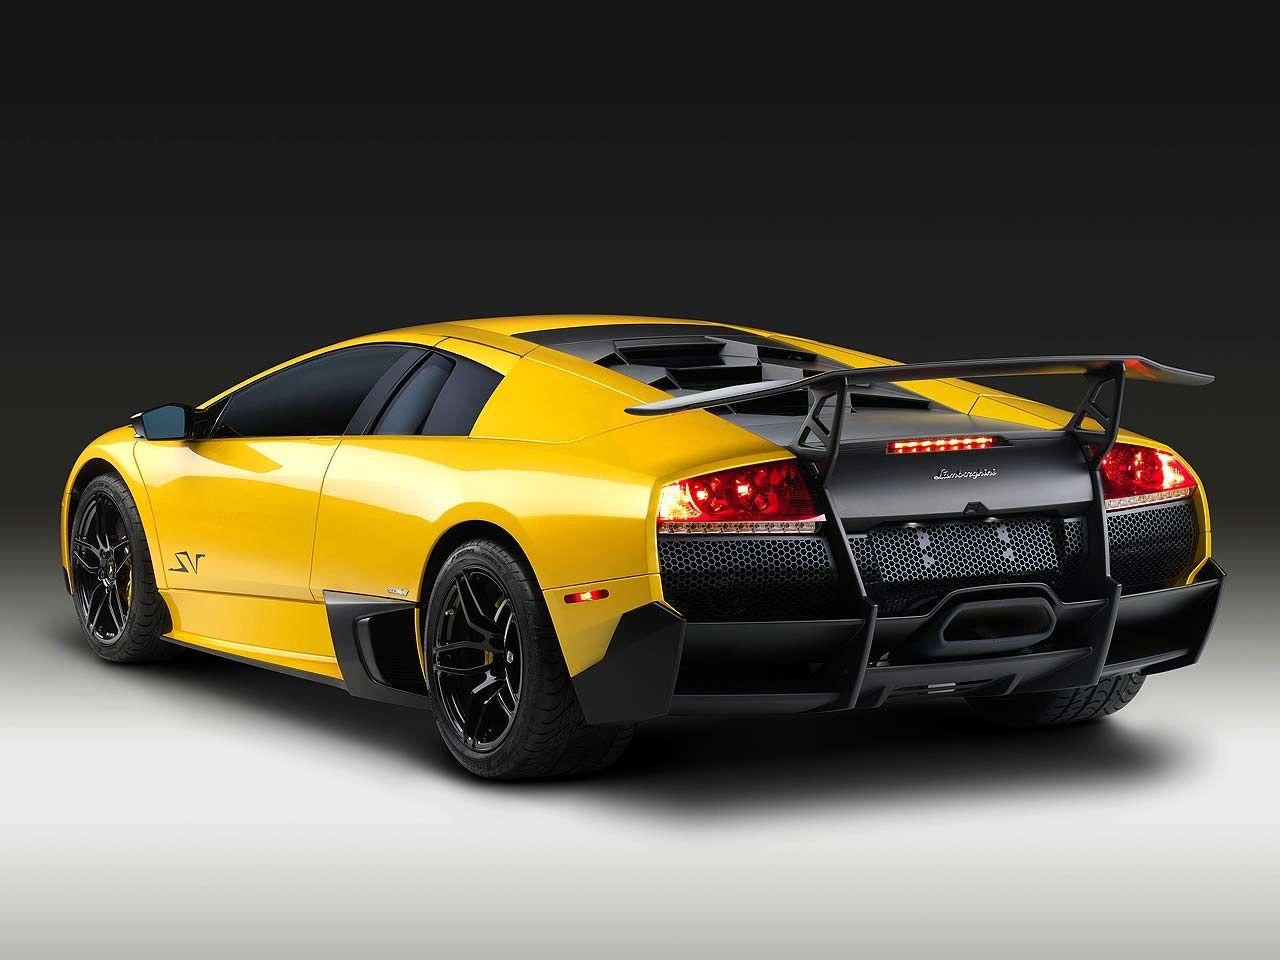 2011 Lamborghini Murciélago LP670,4 SV (SuperVeloce